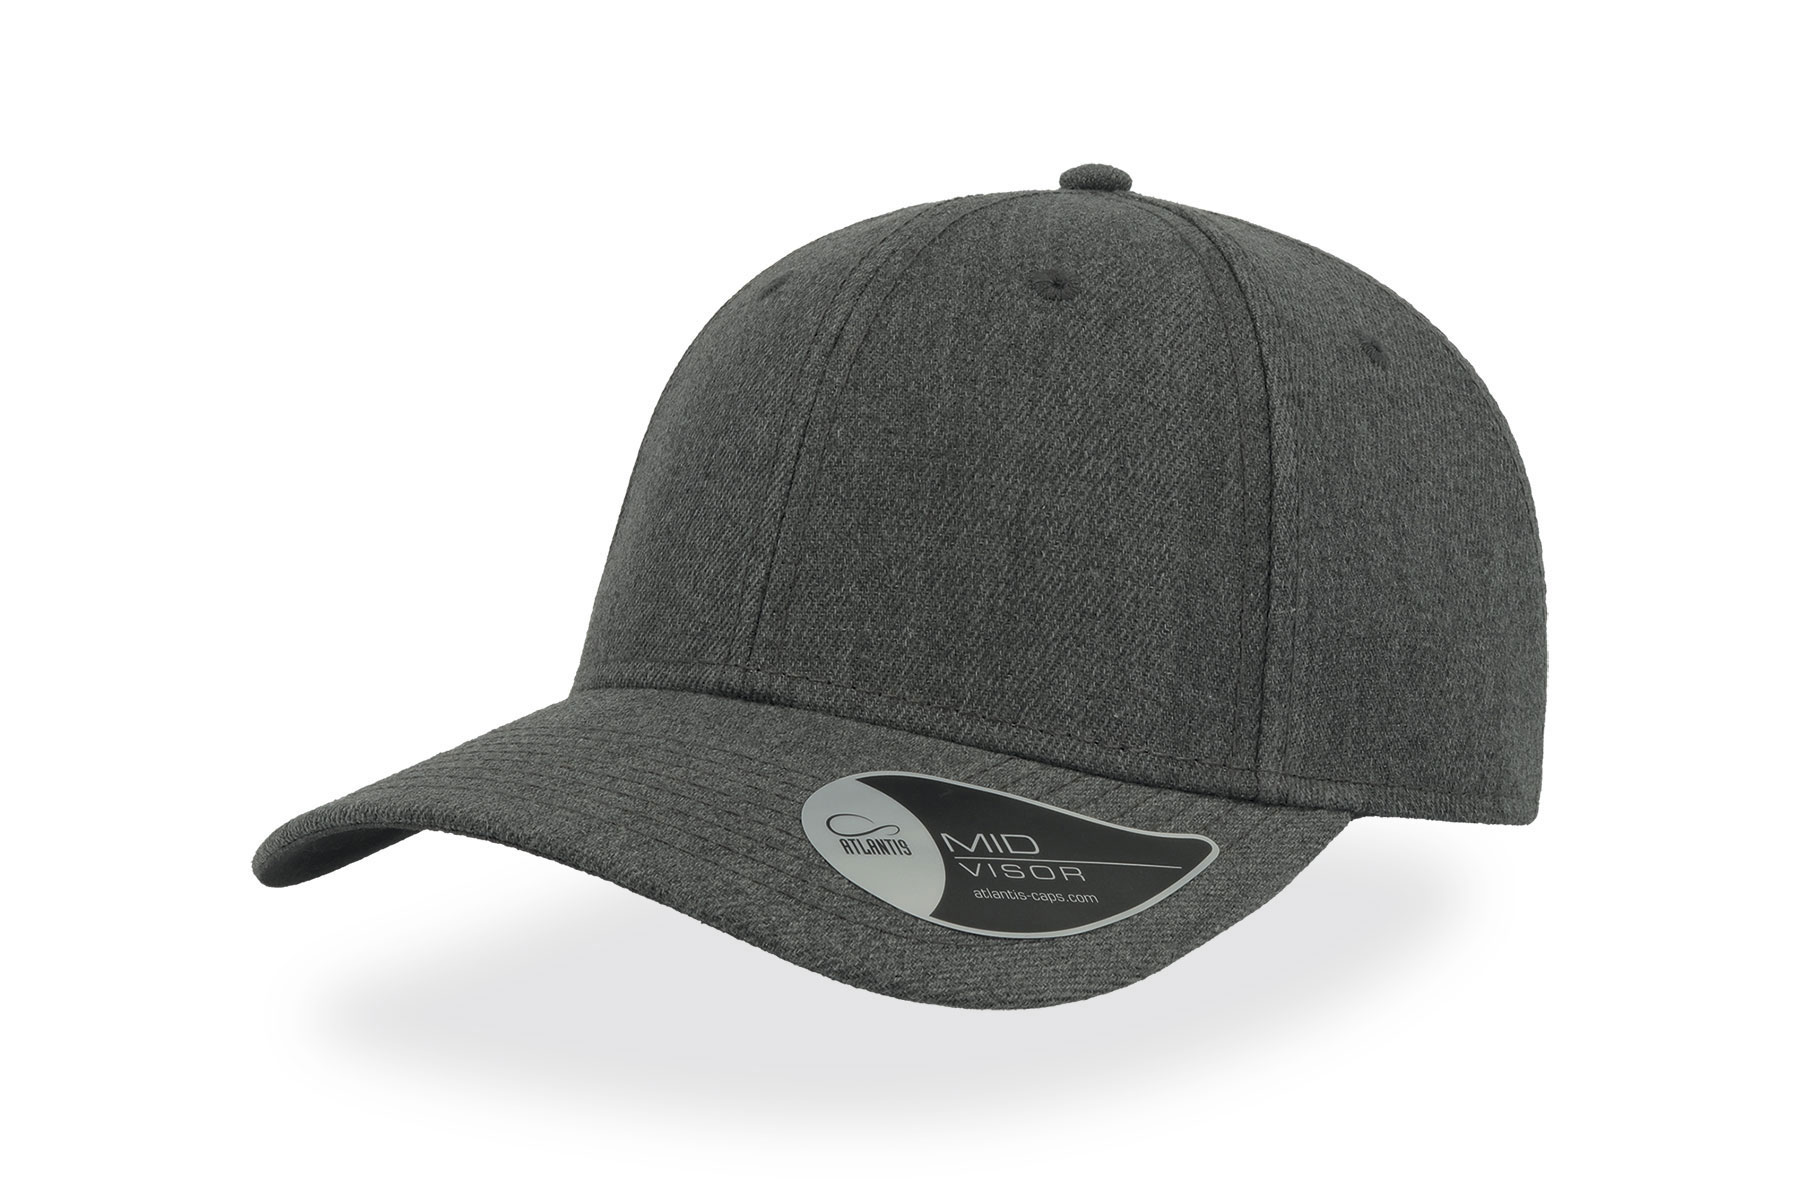 Beat Mid Visor-lippis - NEW 2019 ATLANTIS CAPS & HATS - BEAC - 2